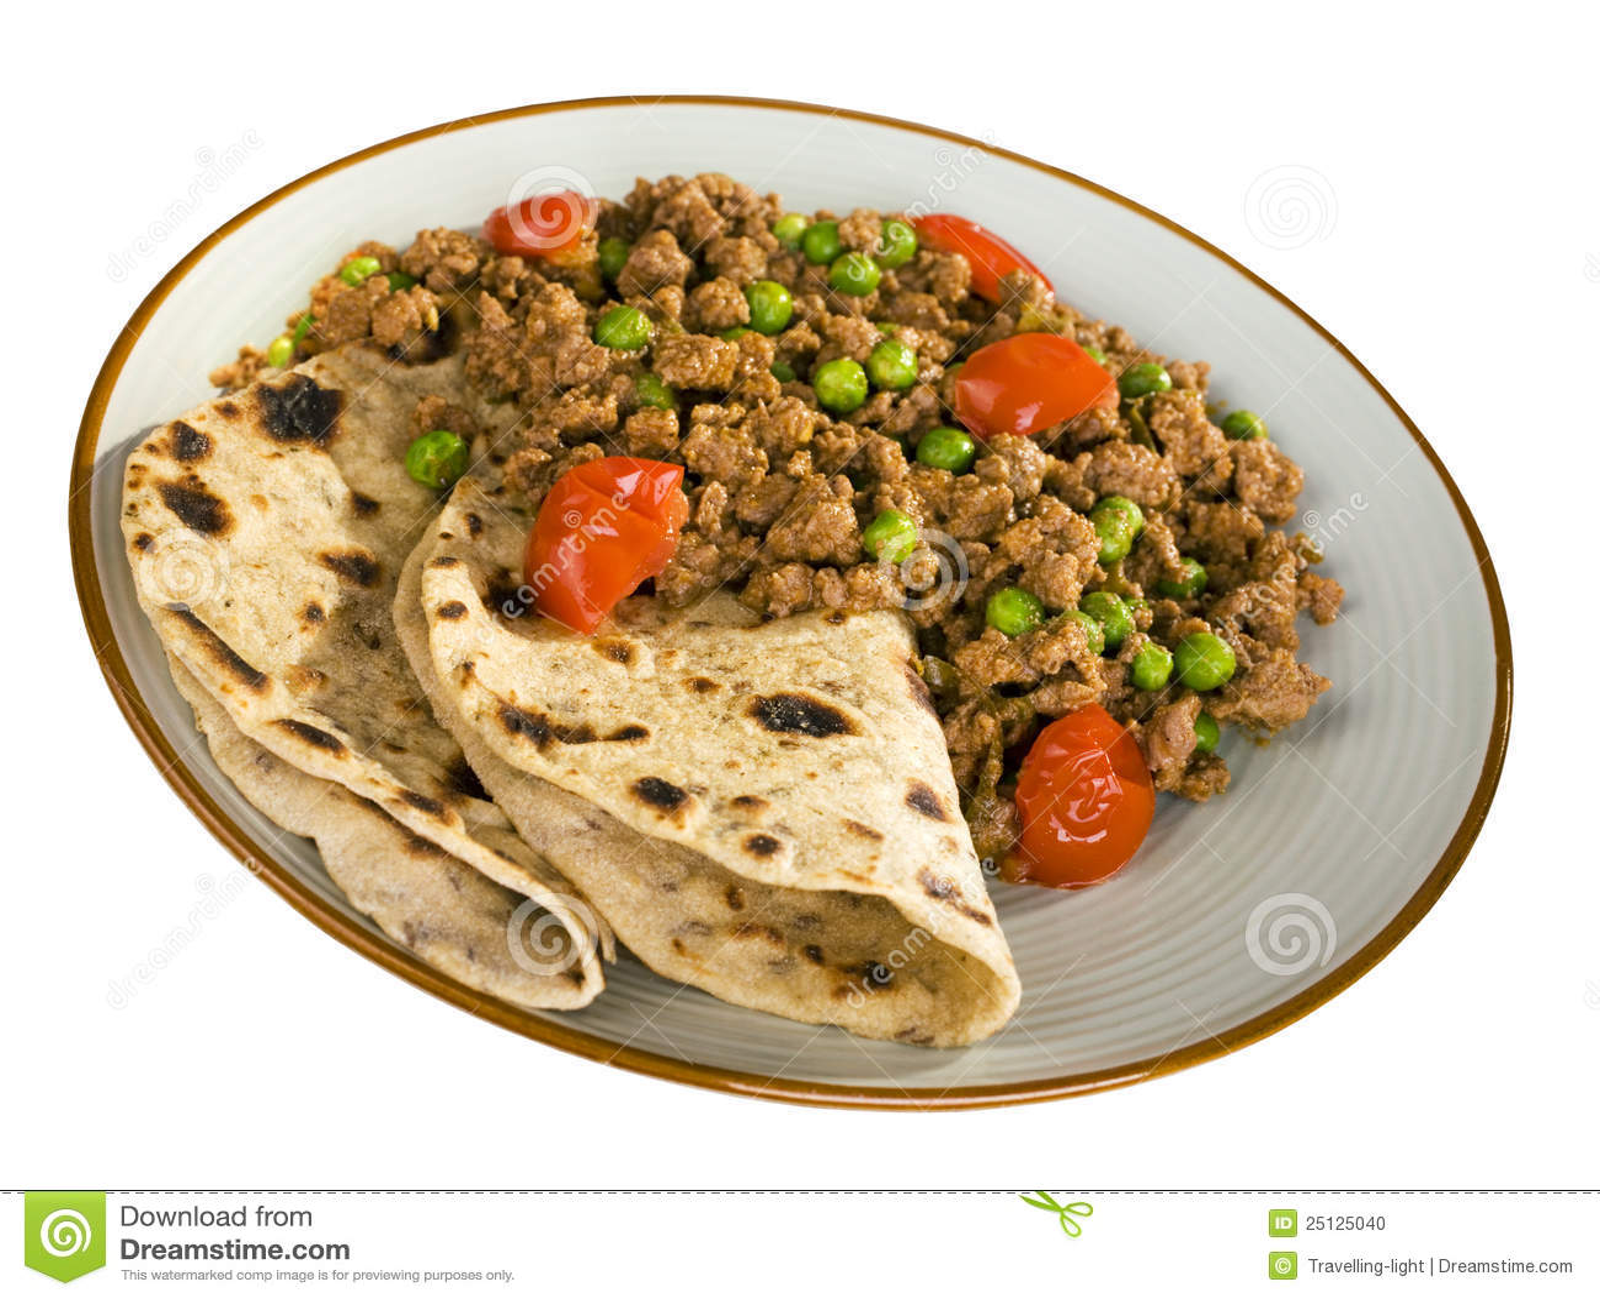 Indian Food Keema And Chapatis Stock Photo - Image: 25125040